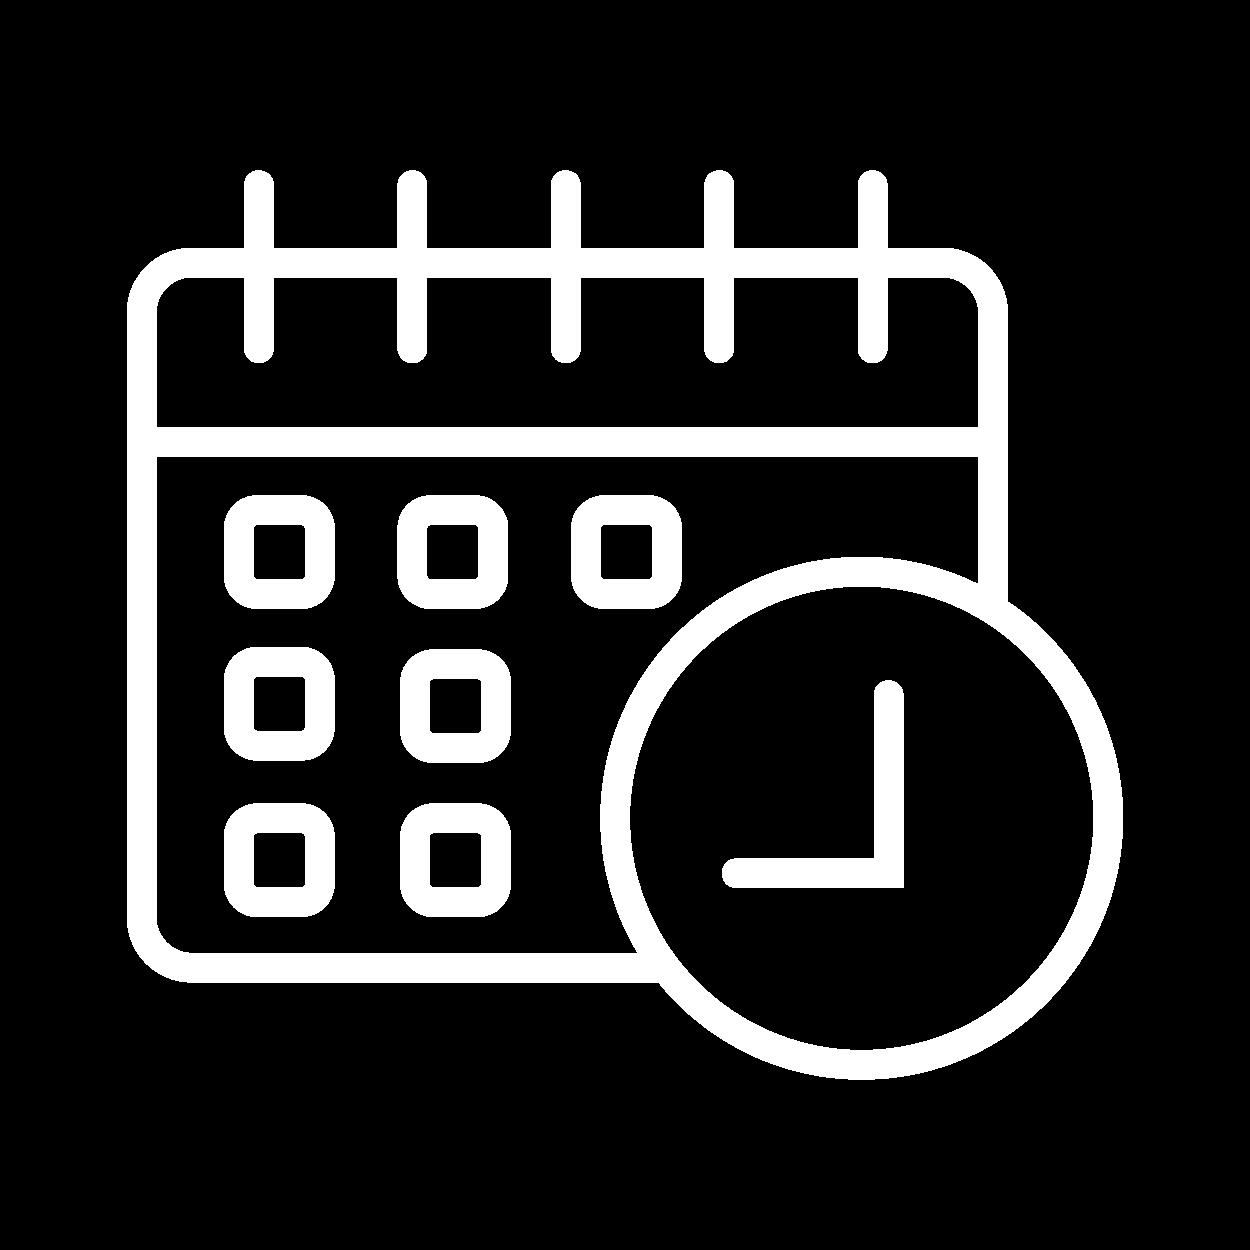 icone vencimento